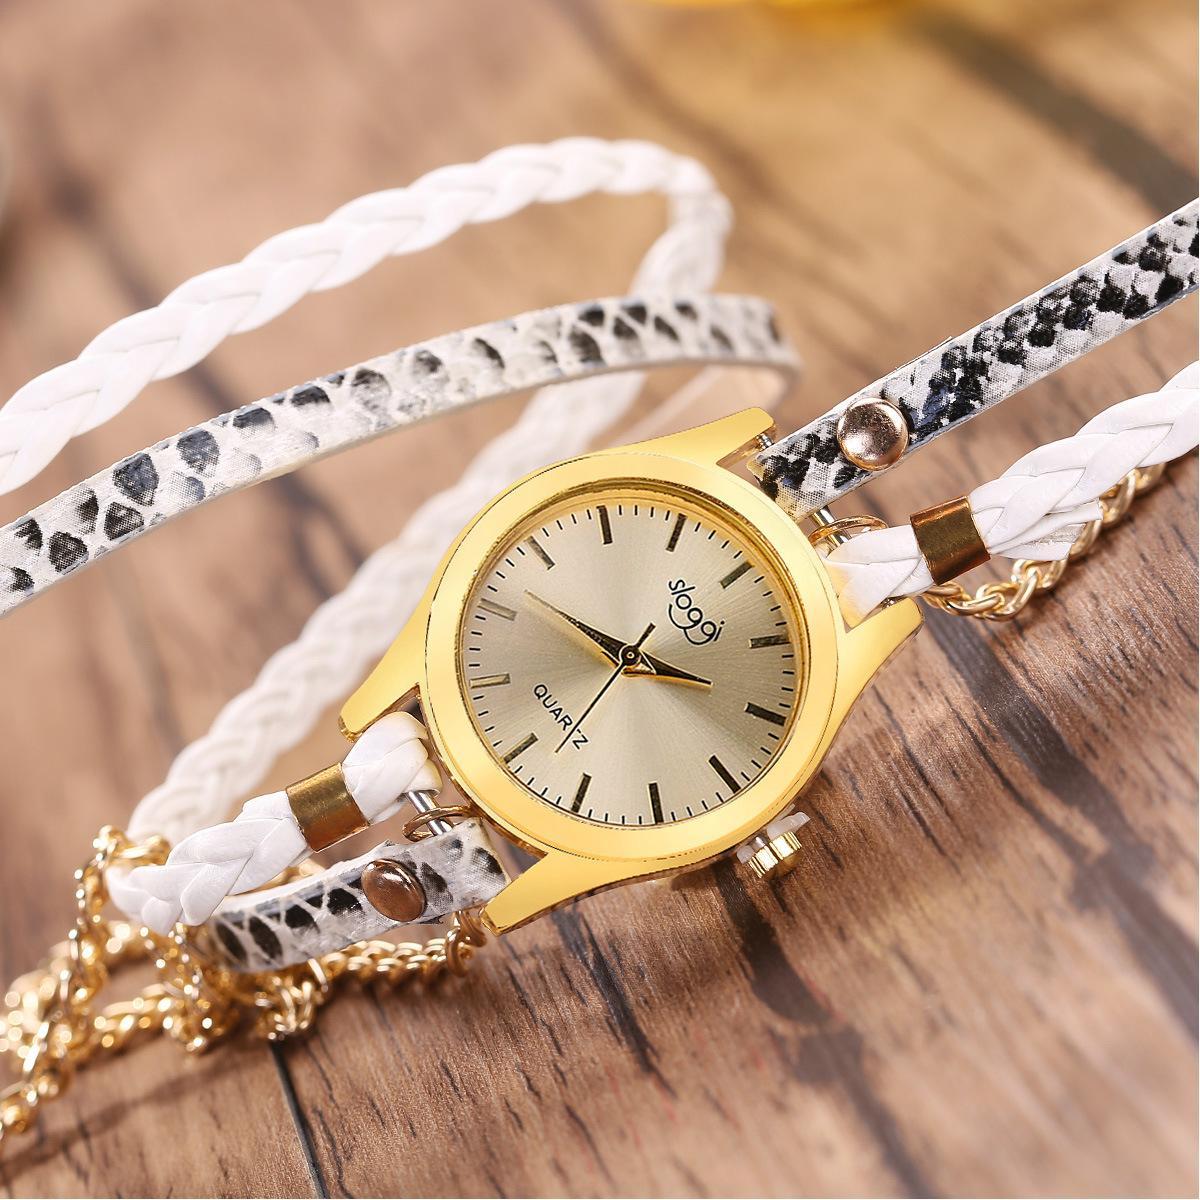 Hot snake Design Band Geneva Handmade Weave watch fashion Women Leather Bracelet Quartz Watch Multicolor Long Straps Dress Wrist Watches